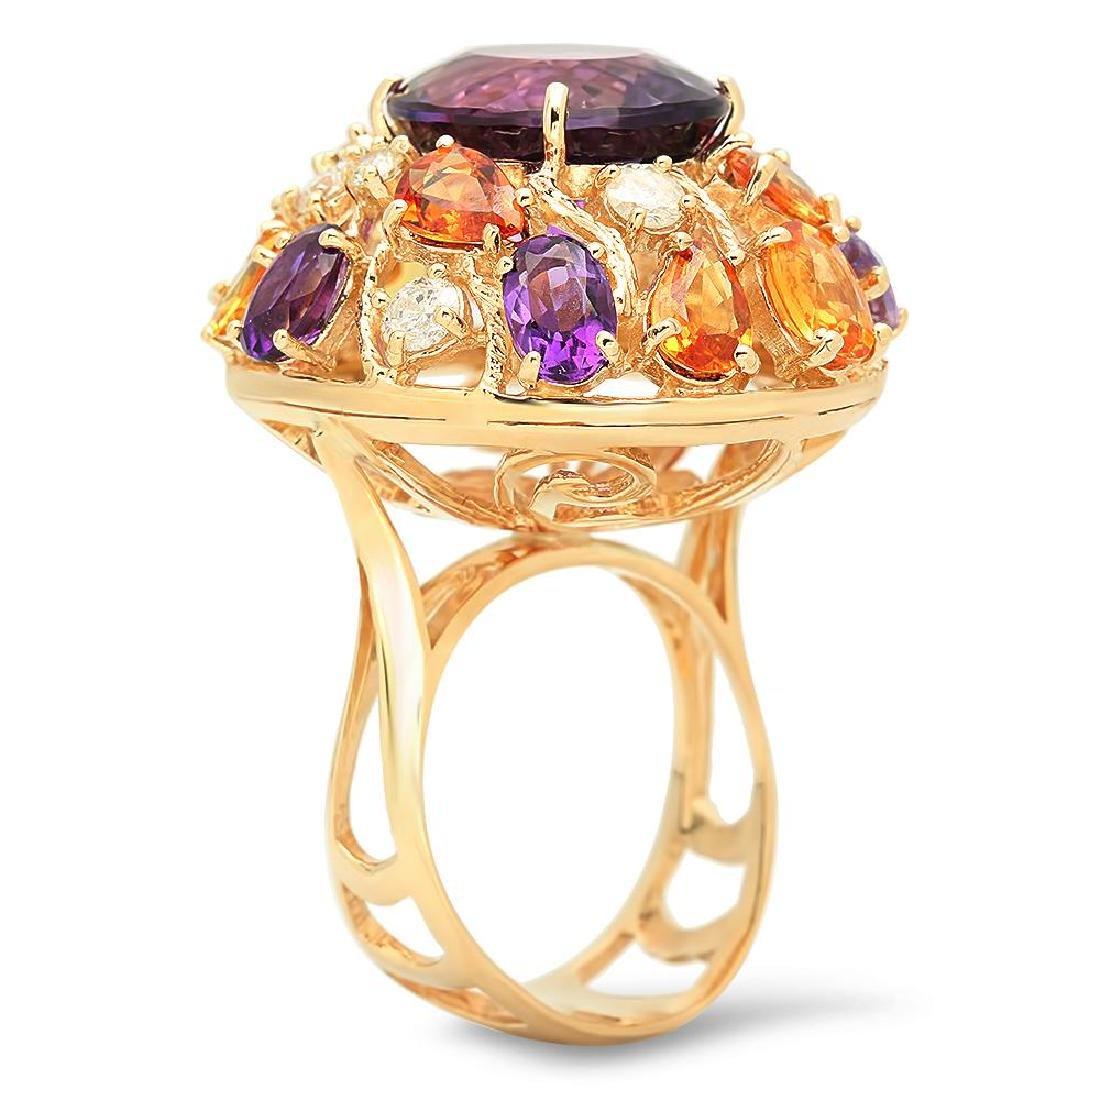 14K Gold 8.26ct Amethyst 6.46ct Sapphire 0.7cts Diamond - 2